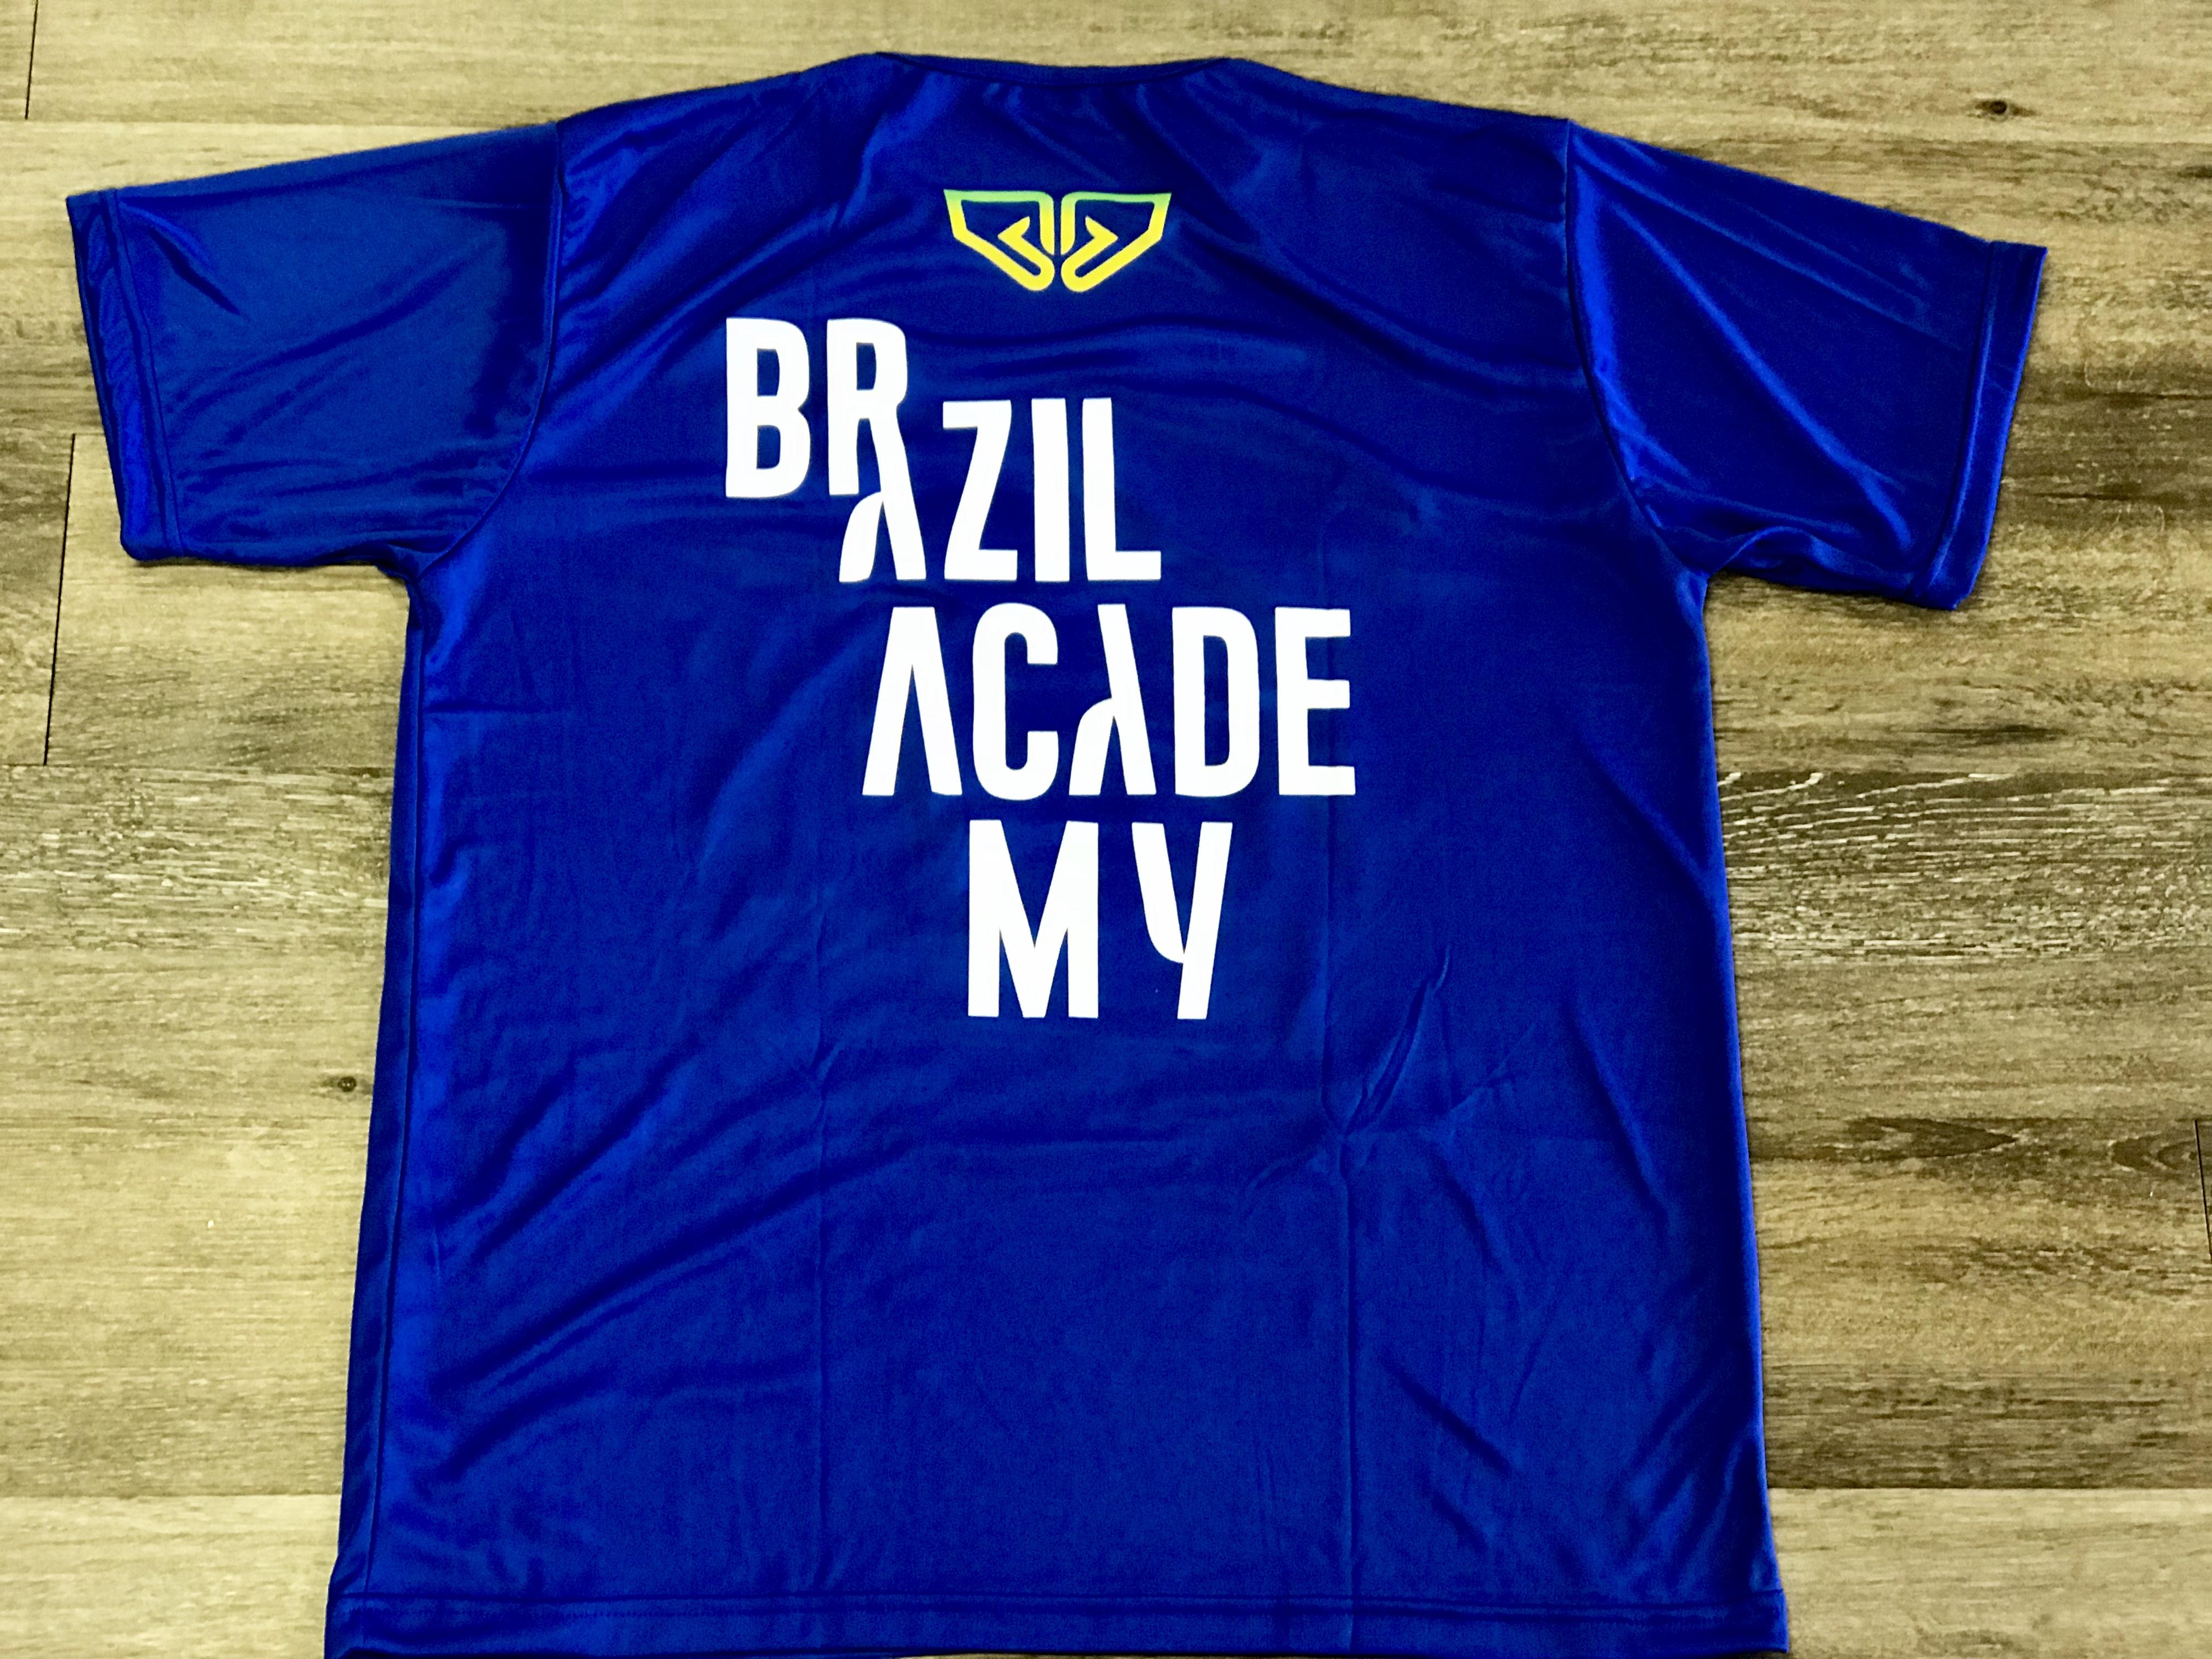 Academy shirts